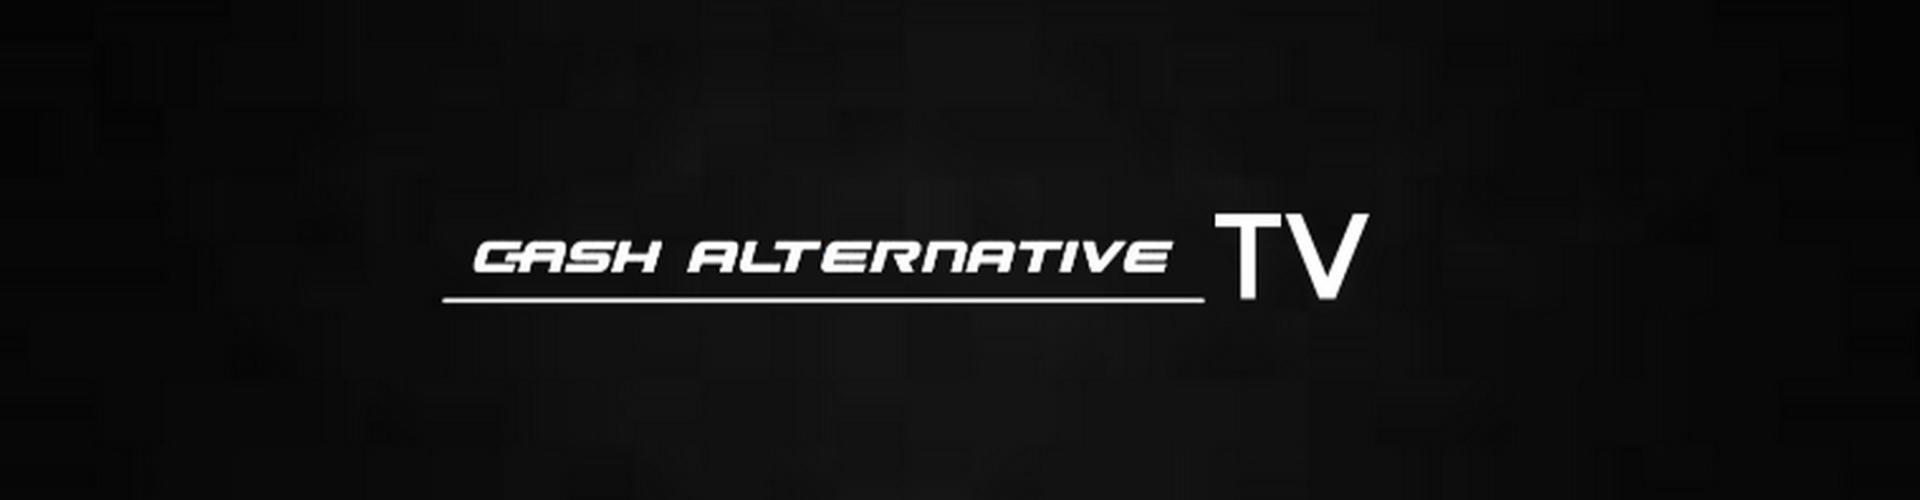 Cash Alternative TV